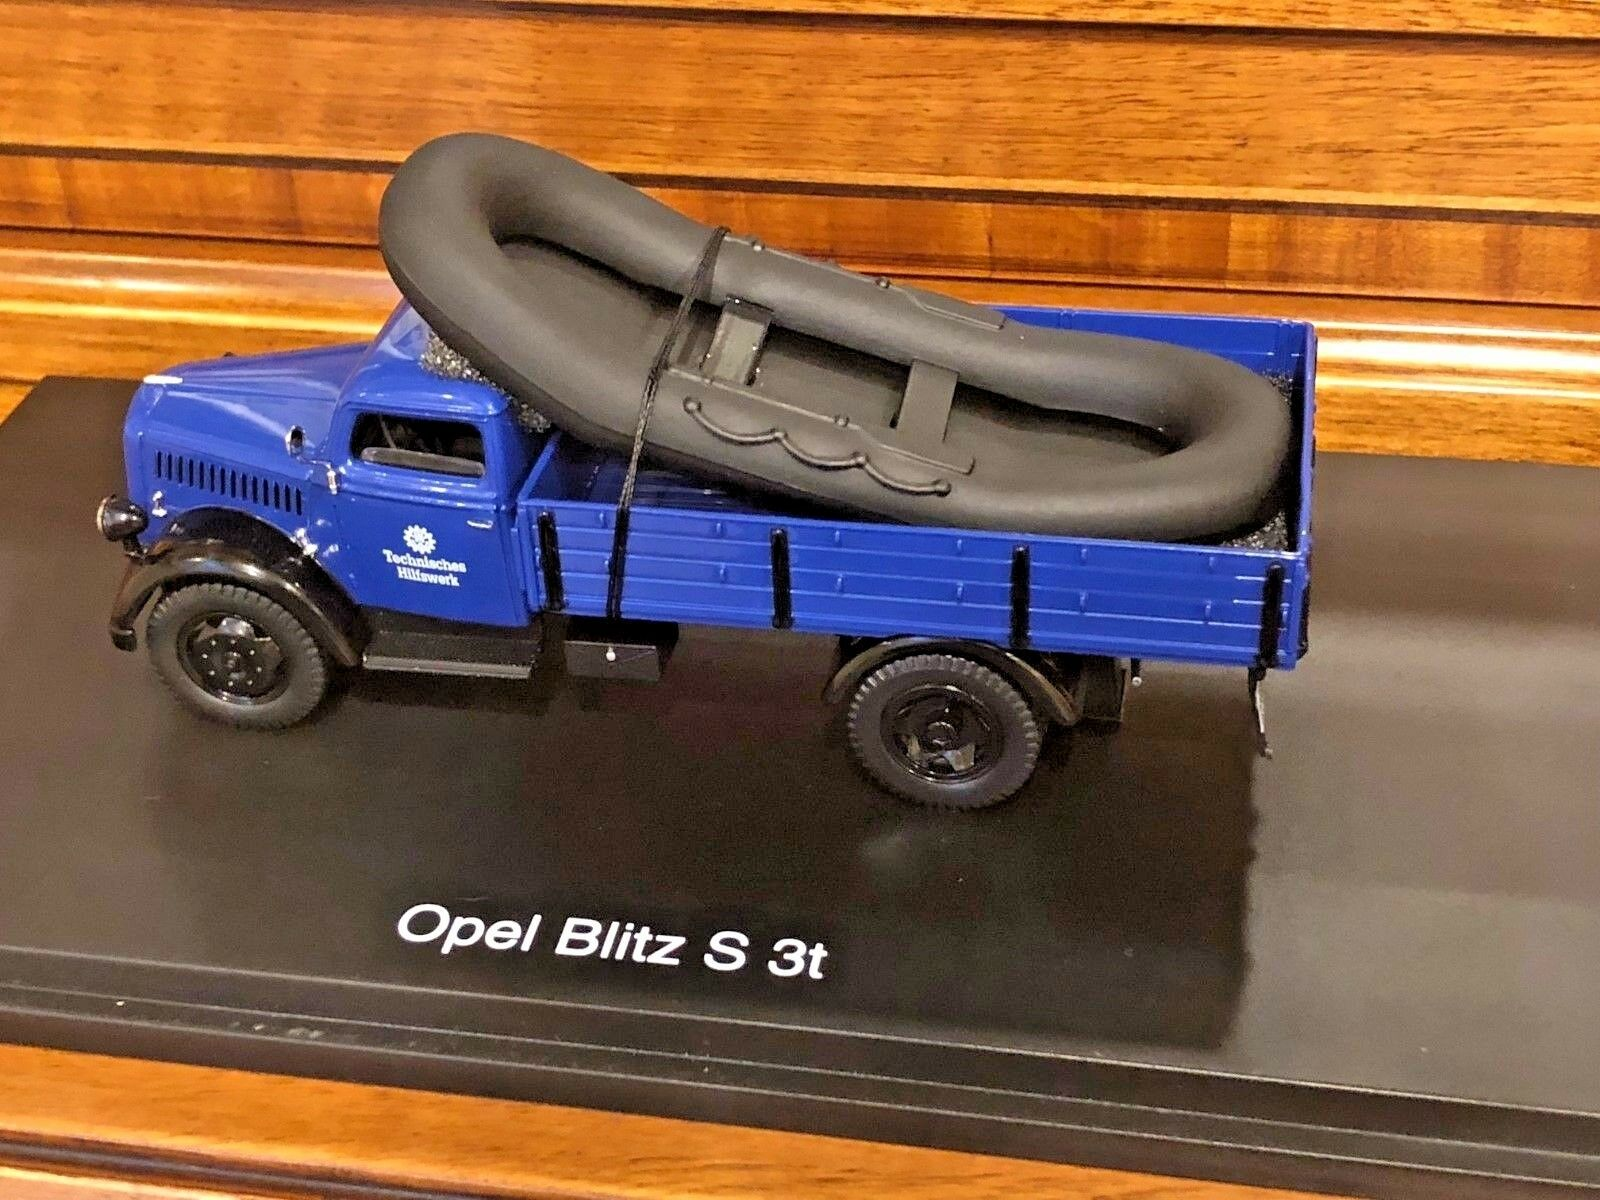 Schuco 1 43 Opel Blitz S 3t Technisches Hilfswerk Caoutchouc Bateau Objet  Shu0